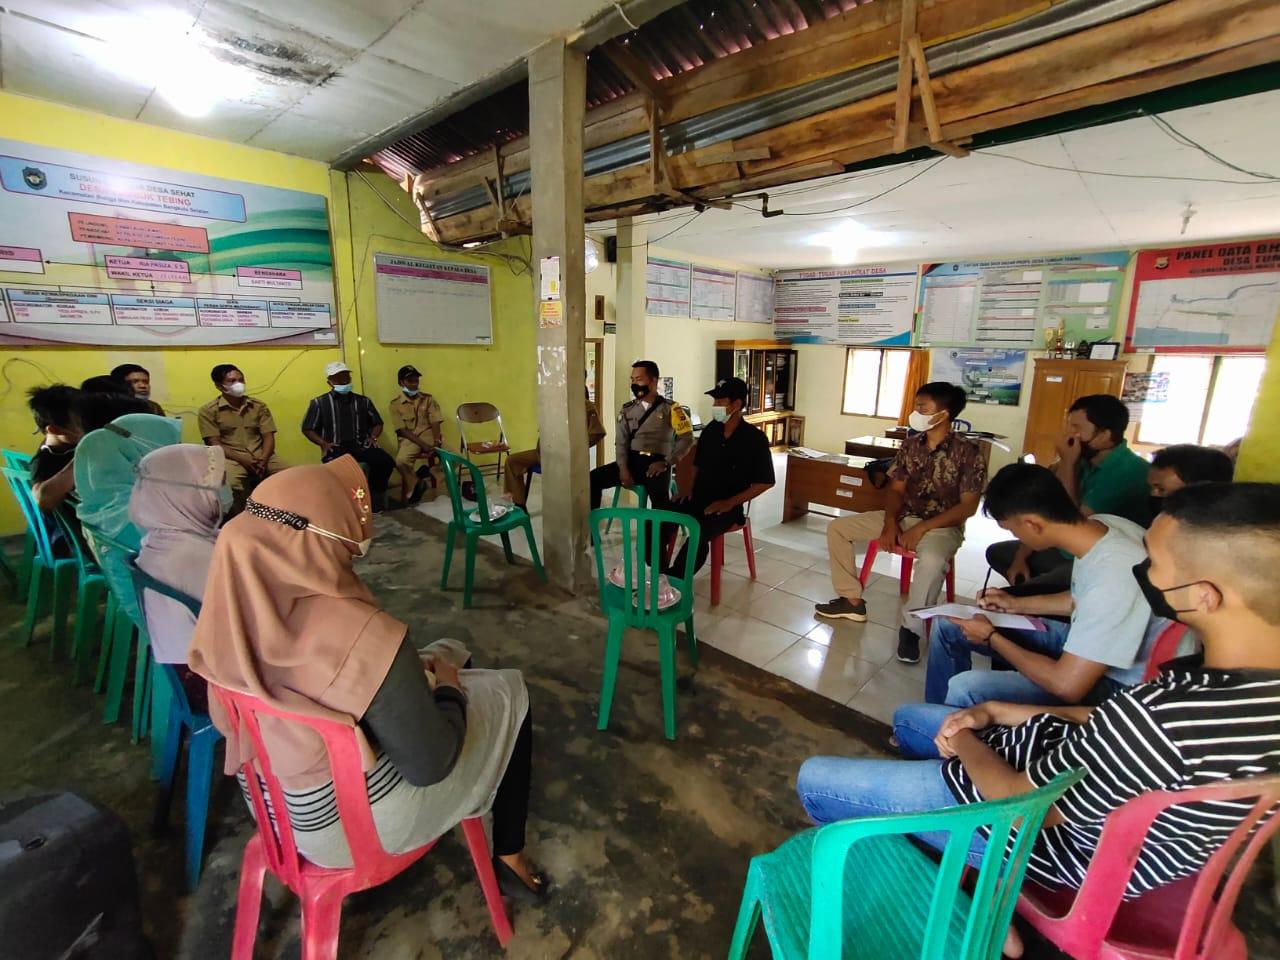 Bhabinkamtibmas Polsek Bunga Mas Mediasi Warga dan 4 Remaja Pembuat Onar